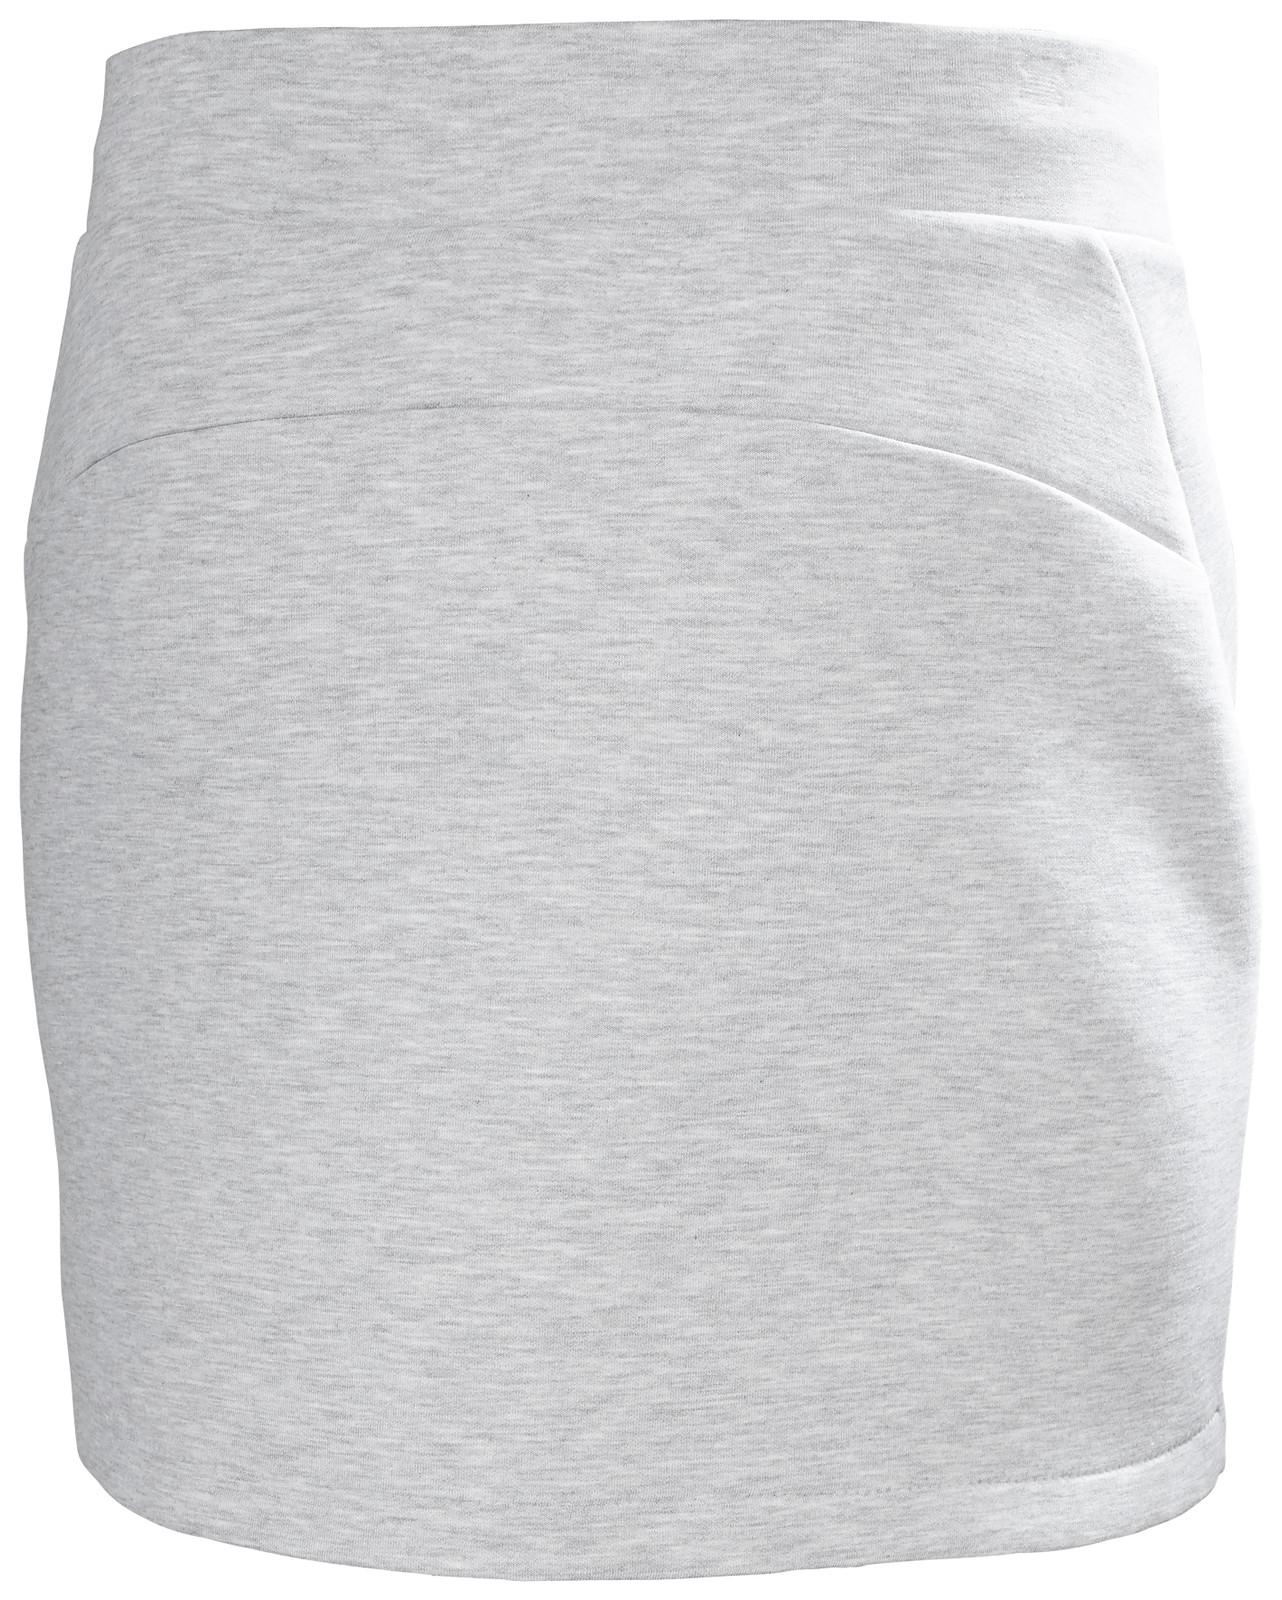 Helly Hansen Womens HP Ocean Skort - Grey Melange, 30255-949